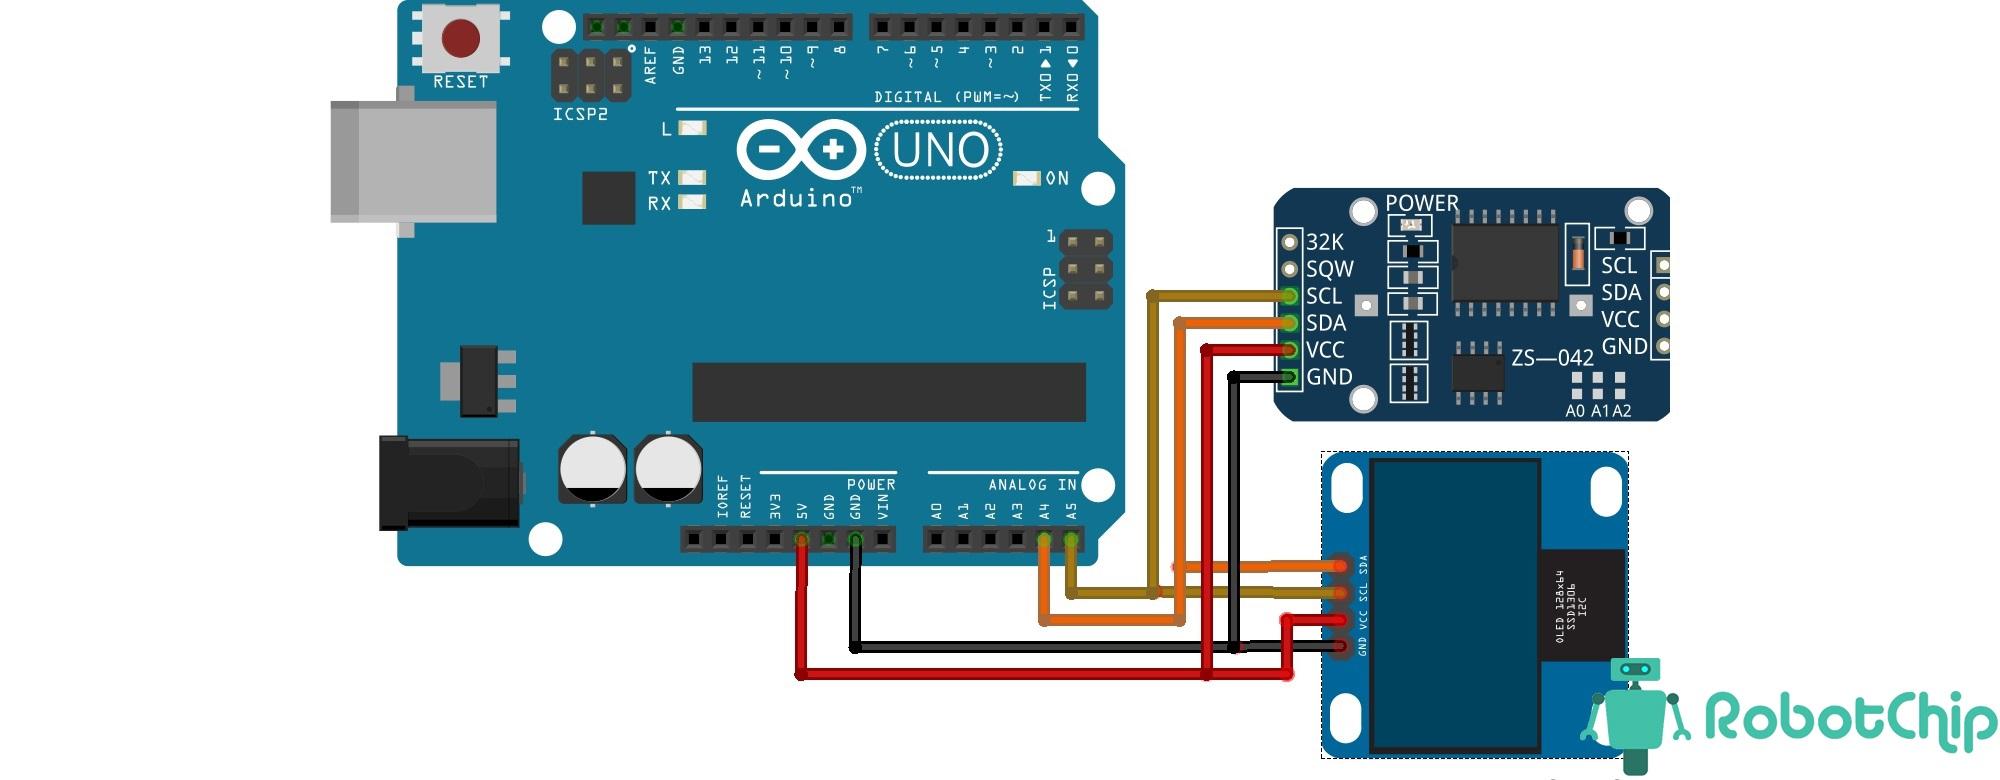 OLED часы (термометр) на arduino и DS3231